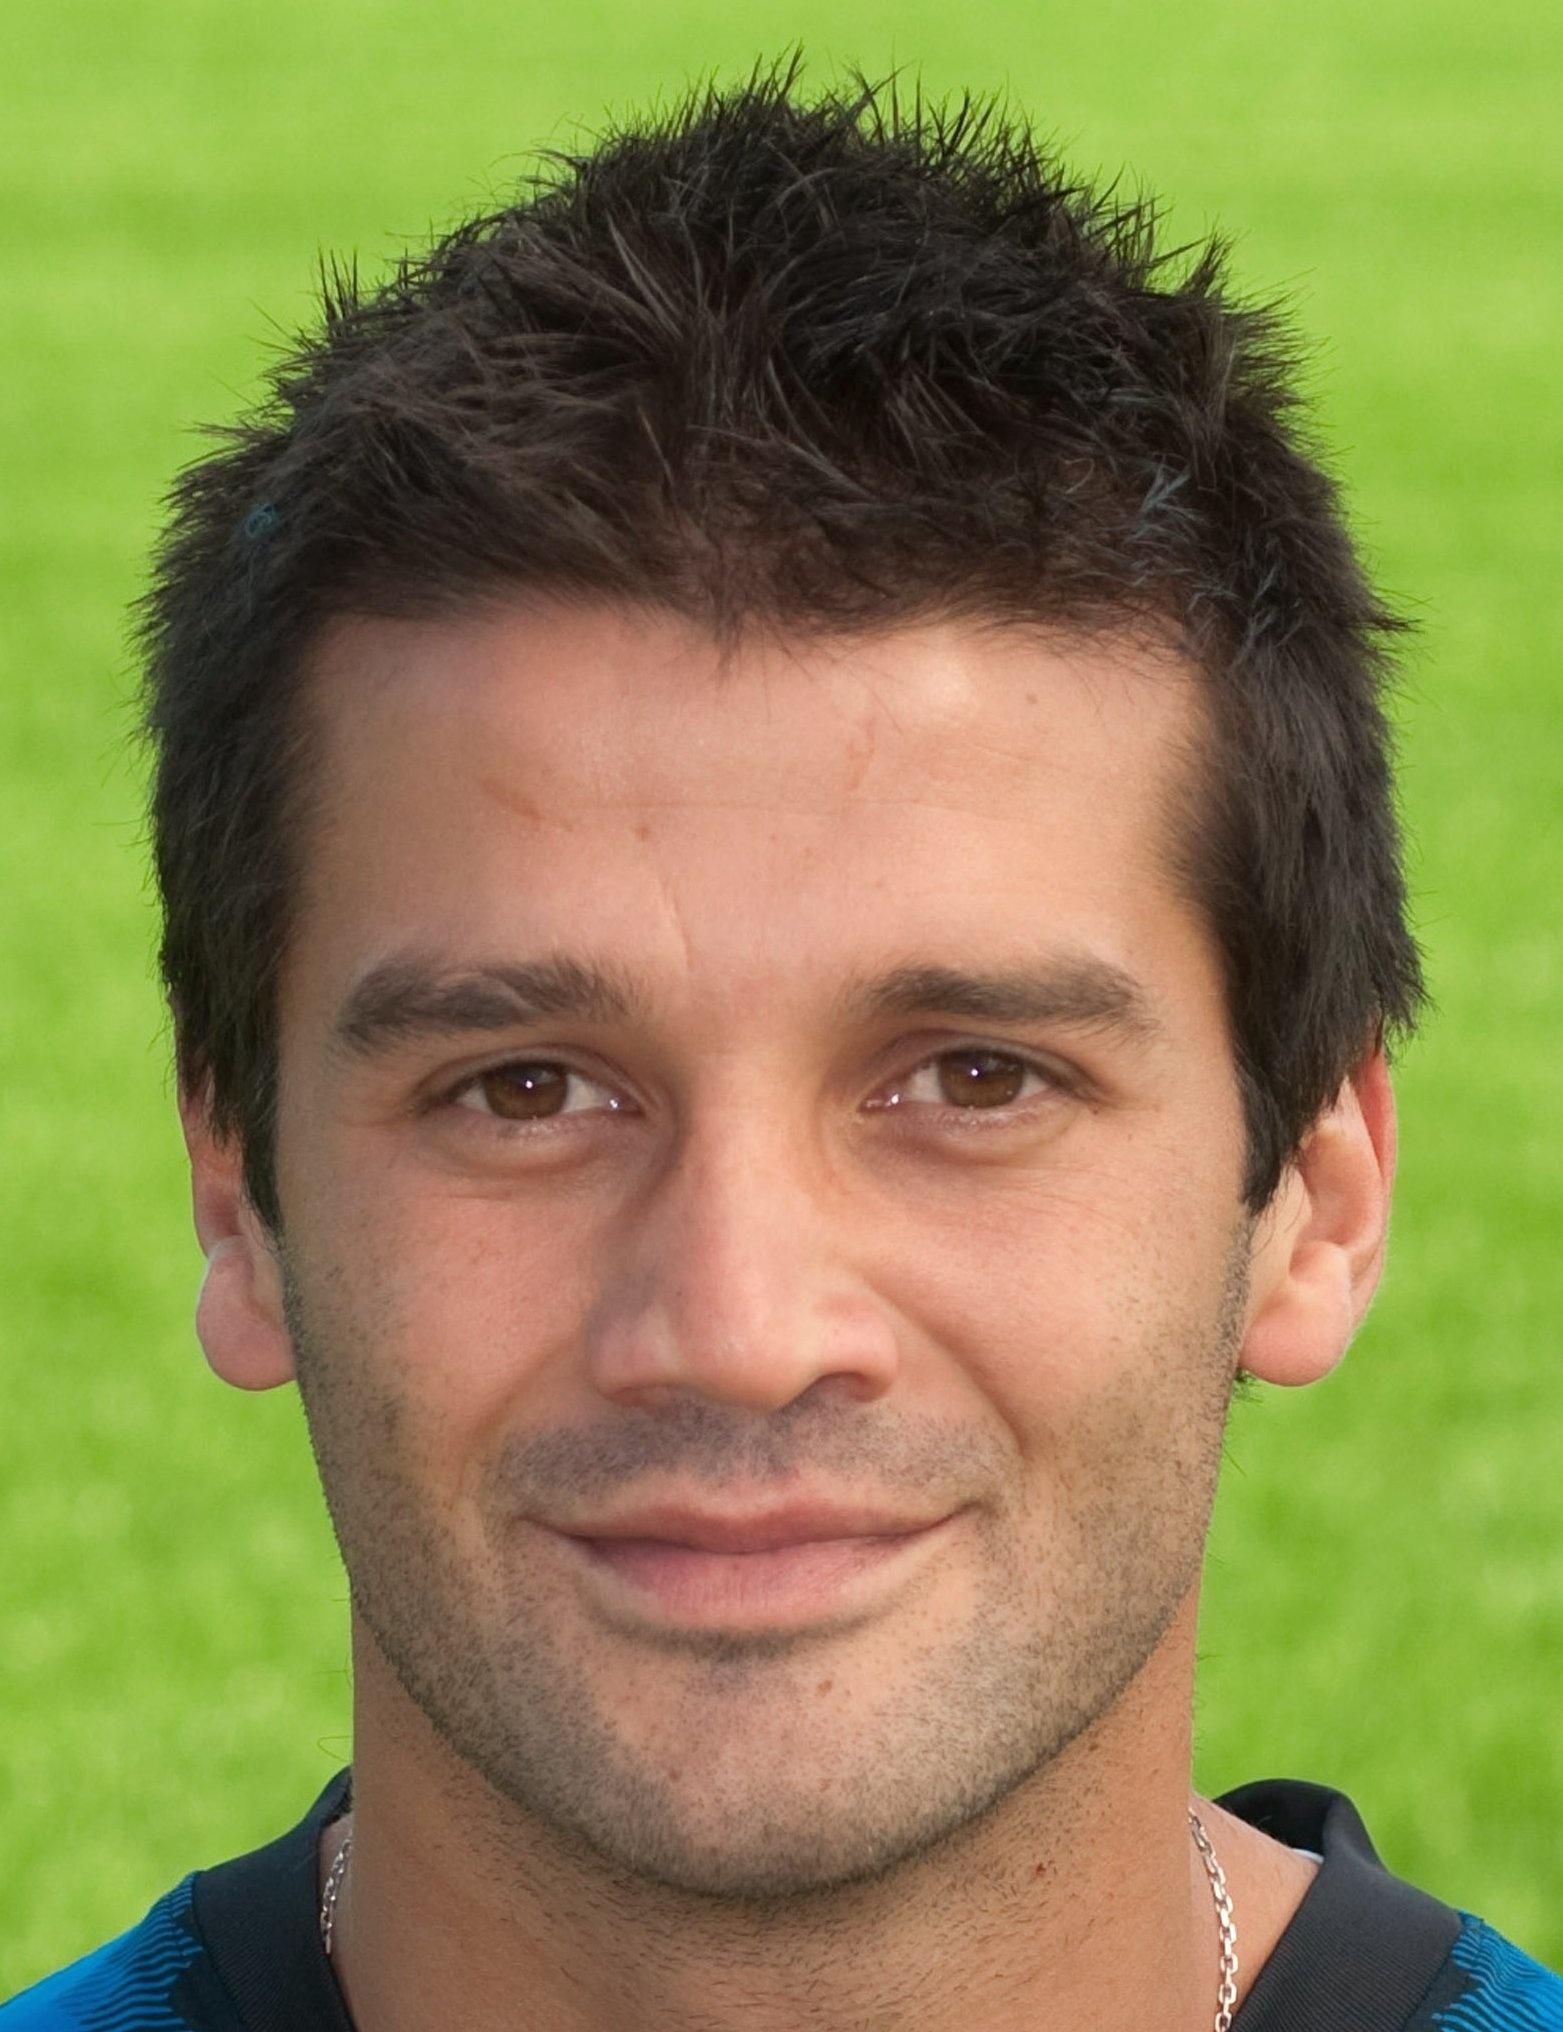 Cristian chivu player profile transfermarkt altavistaventures Image collections